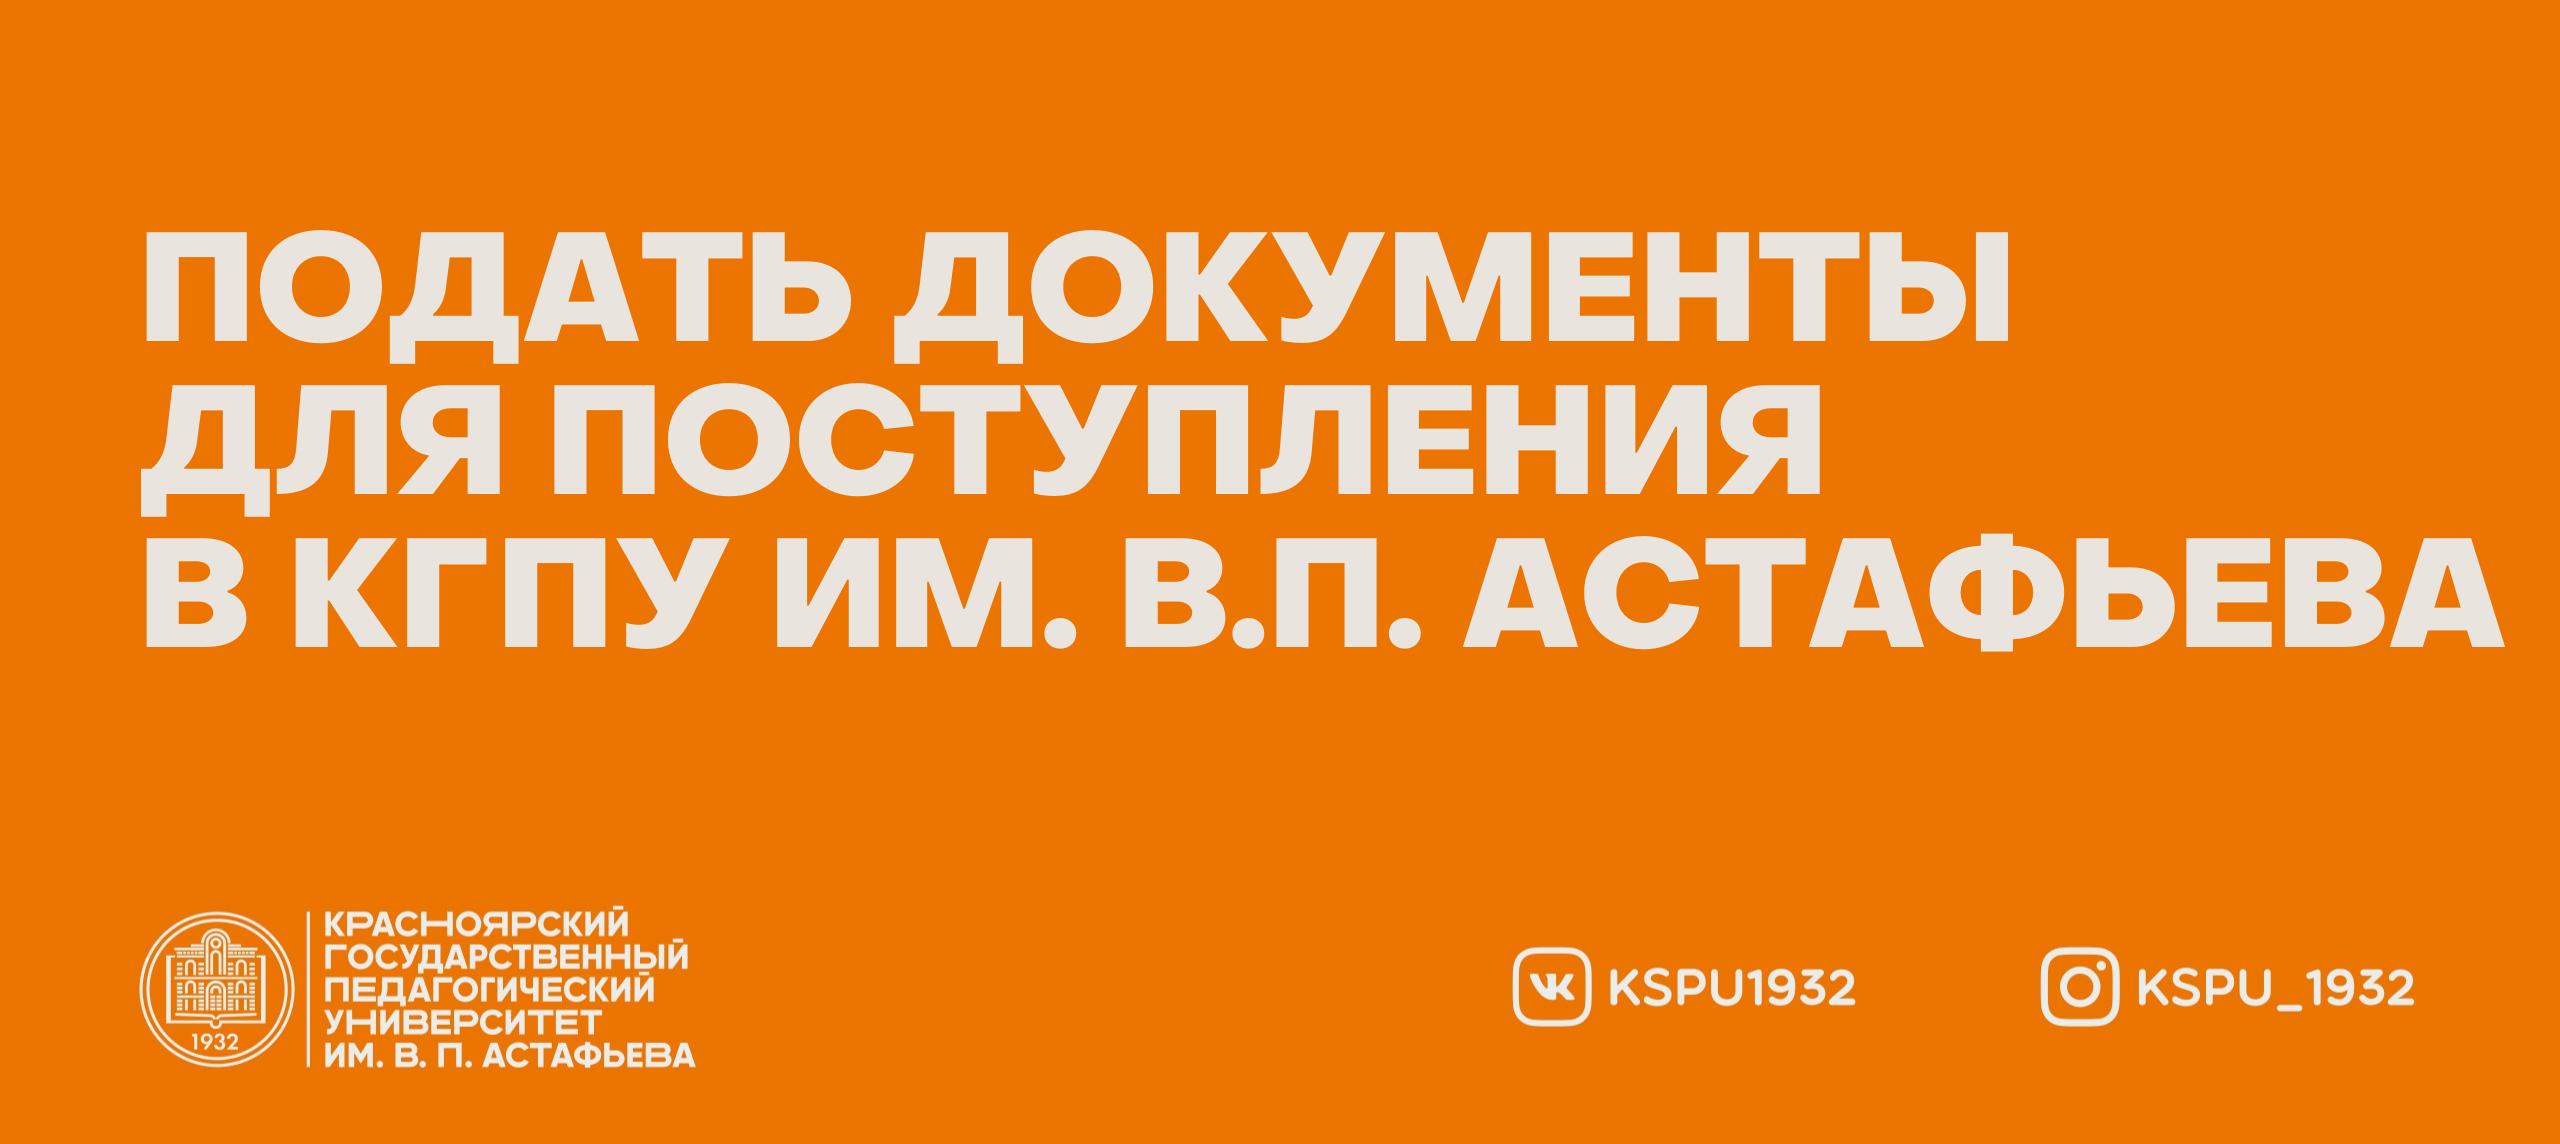 http://static-web-0.kspu.ru/web/documents/2021/06/17/bbb1e6c6c0efa16a22e51b002531aac9/dokumentyi-dlya-postupleniya.png/